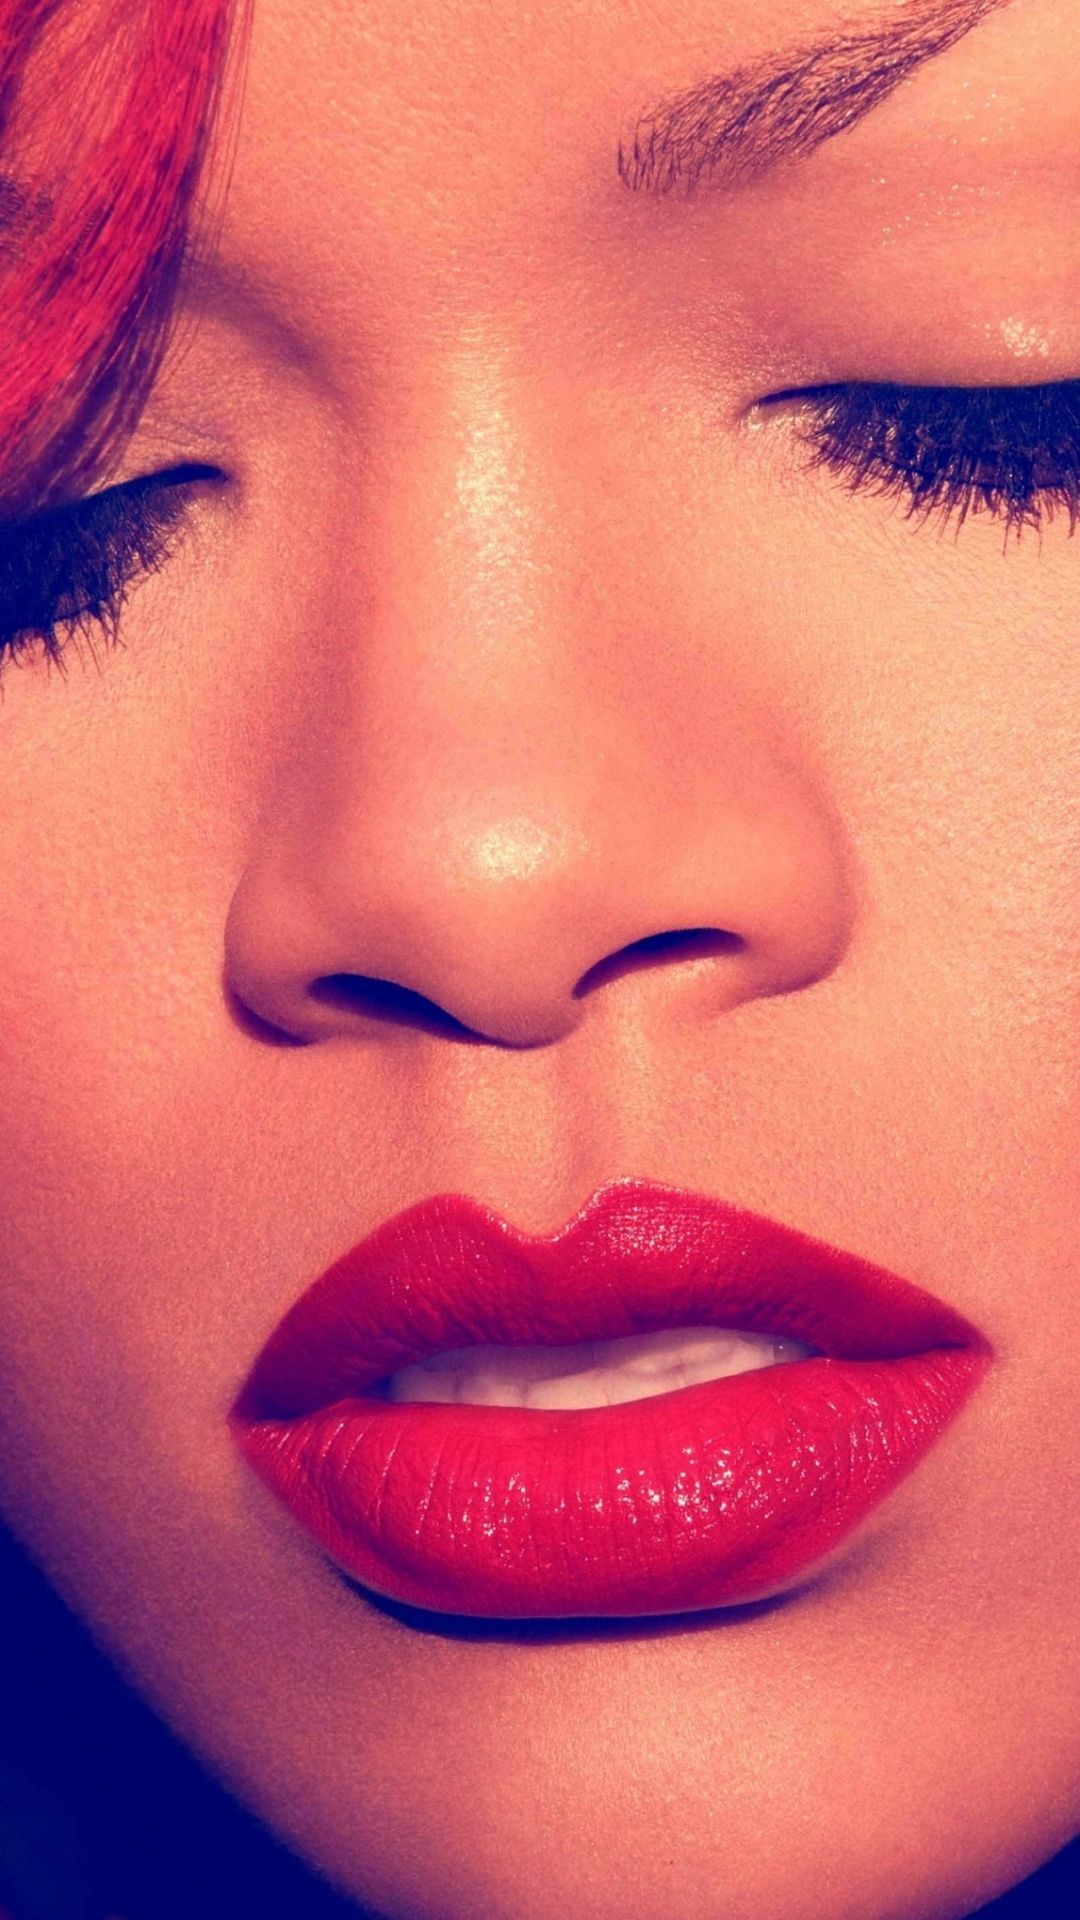 iPhone 6 Plus Music/Rihanna Wallpaper ID 349489